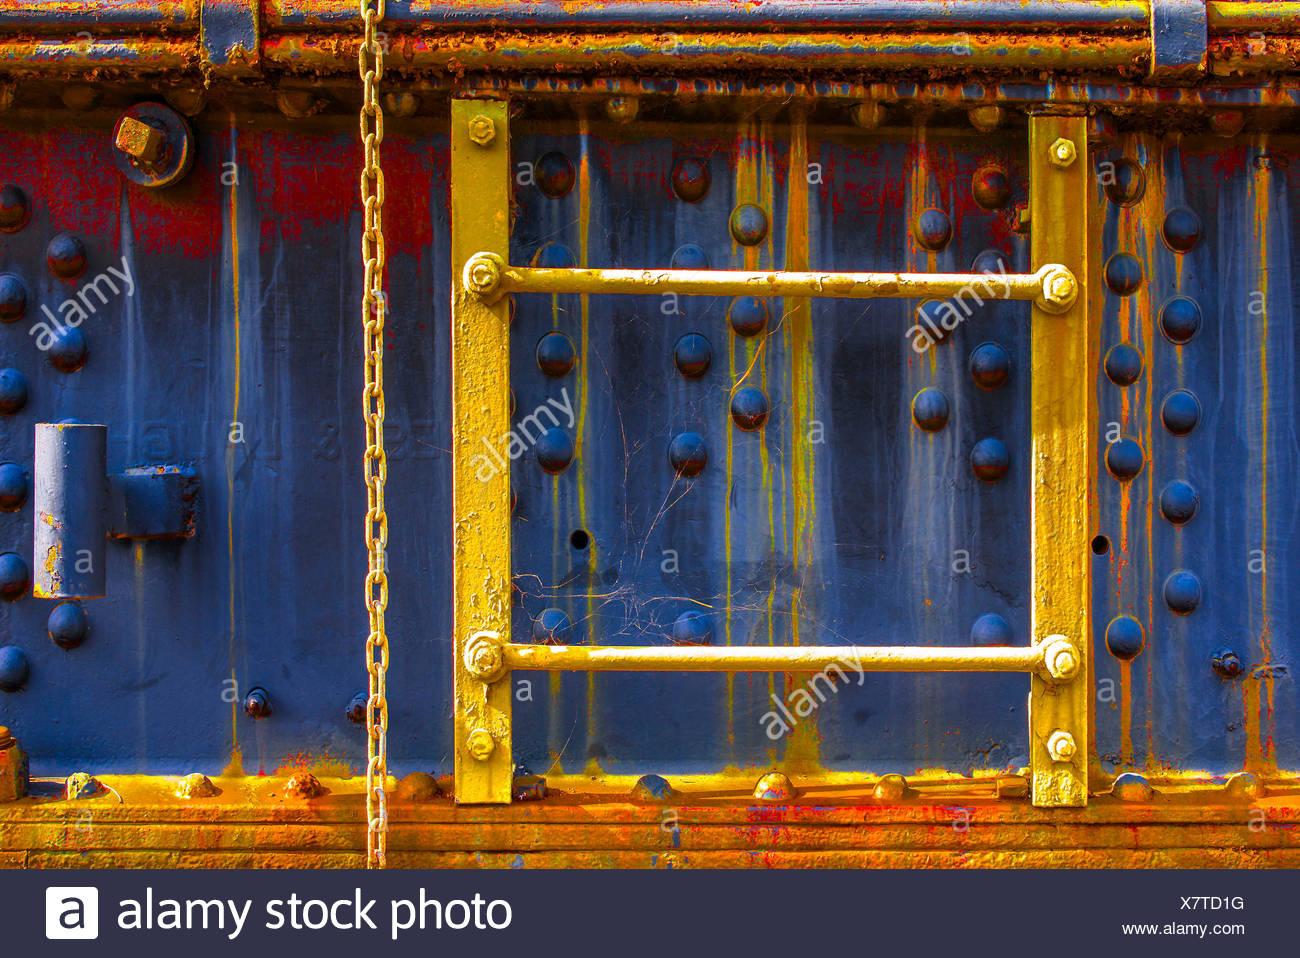 Old Railroad Wagon Detail, Stock Photo